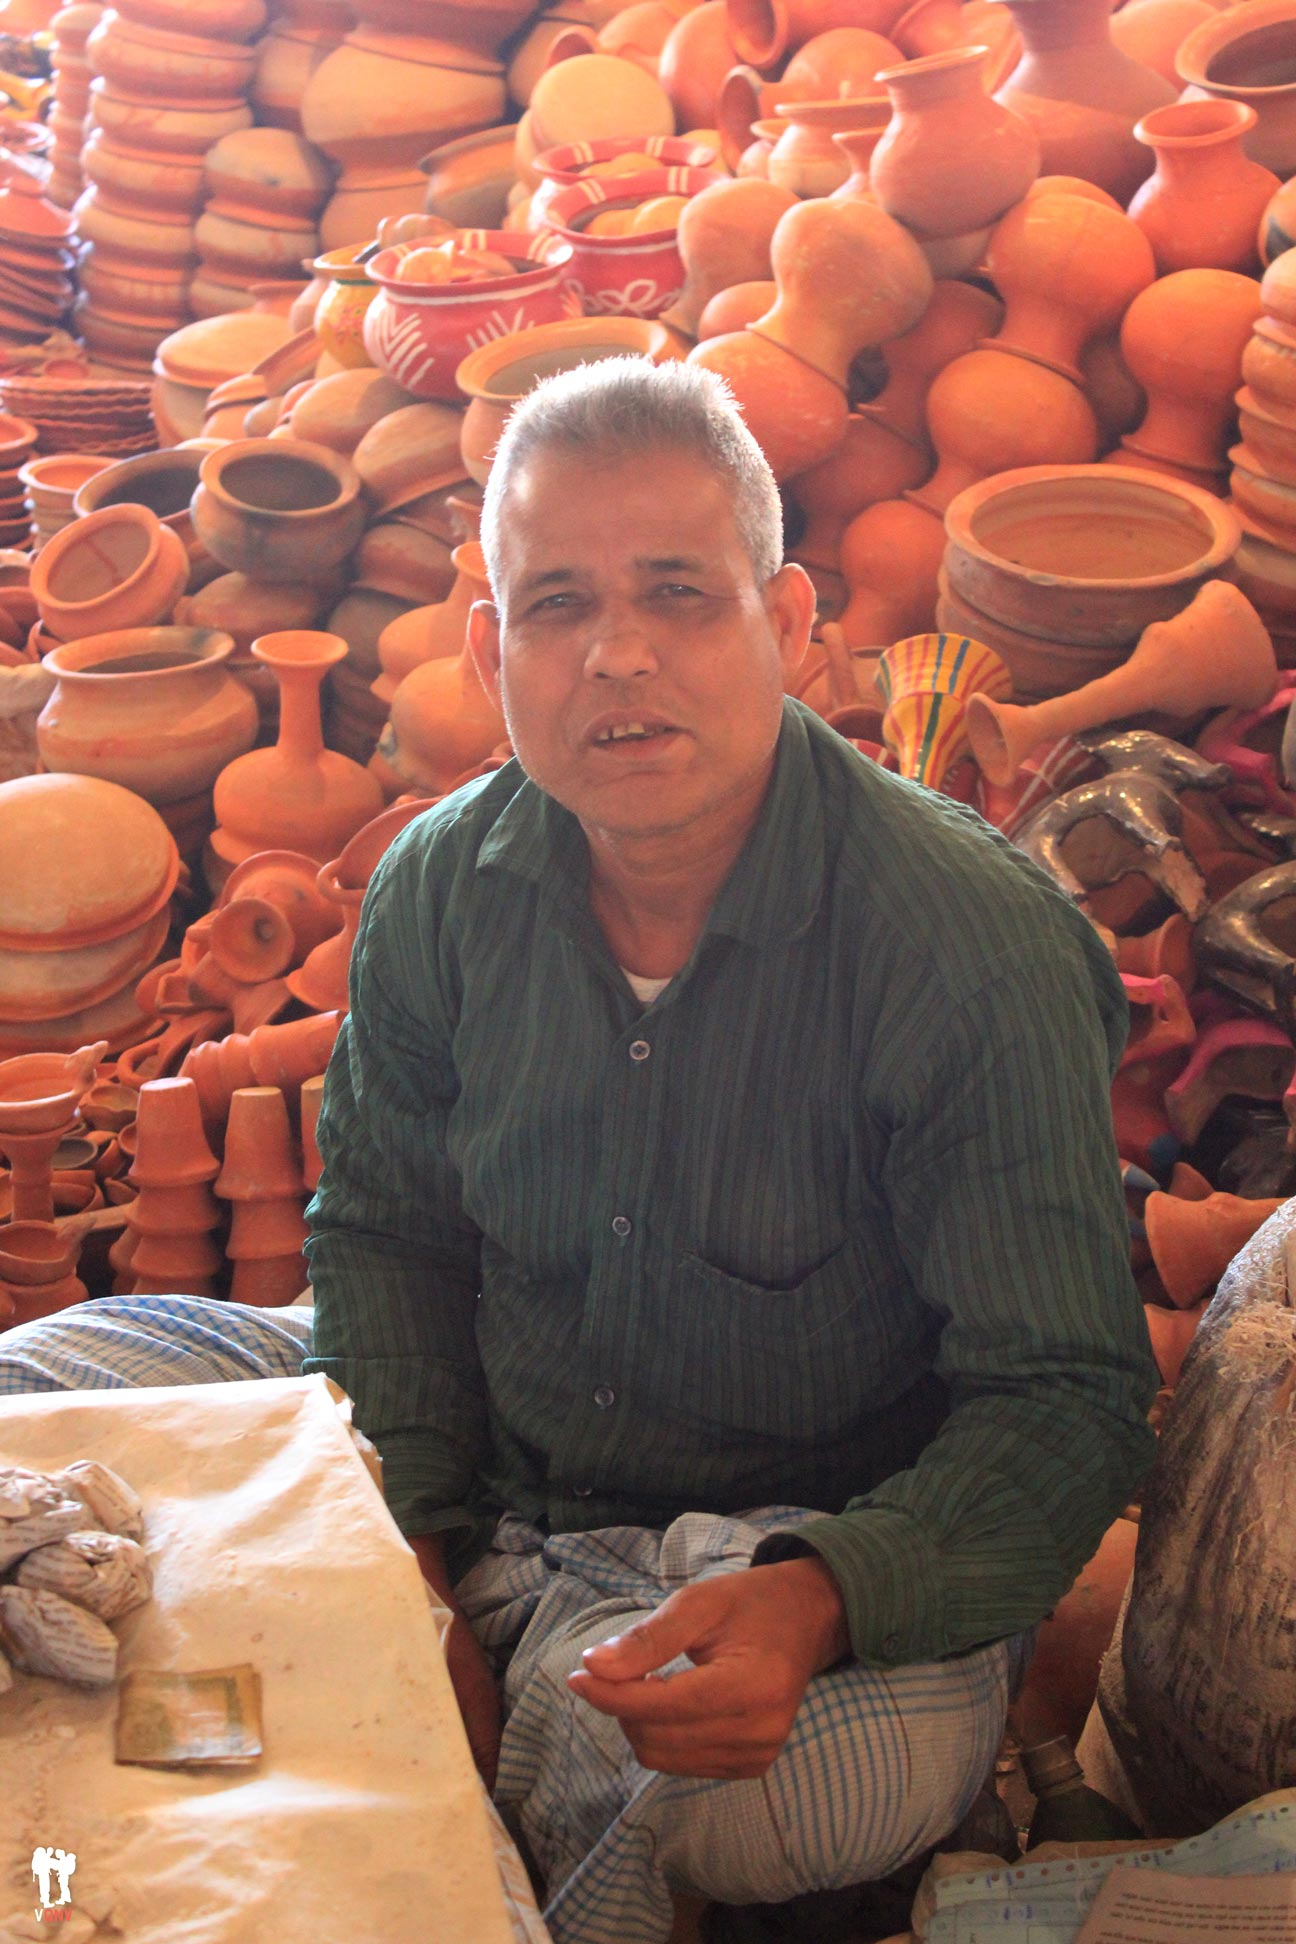 Vendedor de vasijas de barro